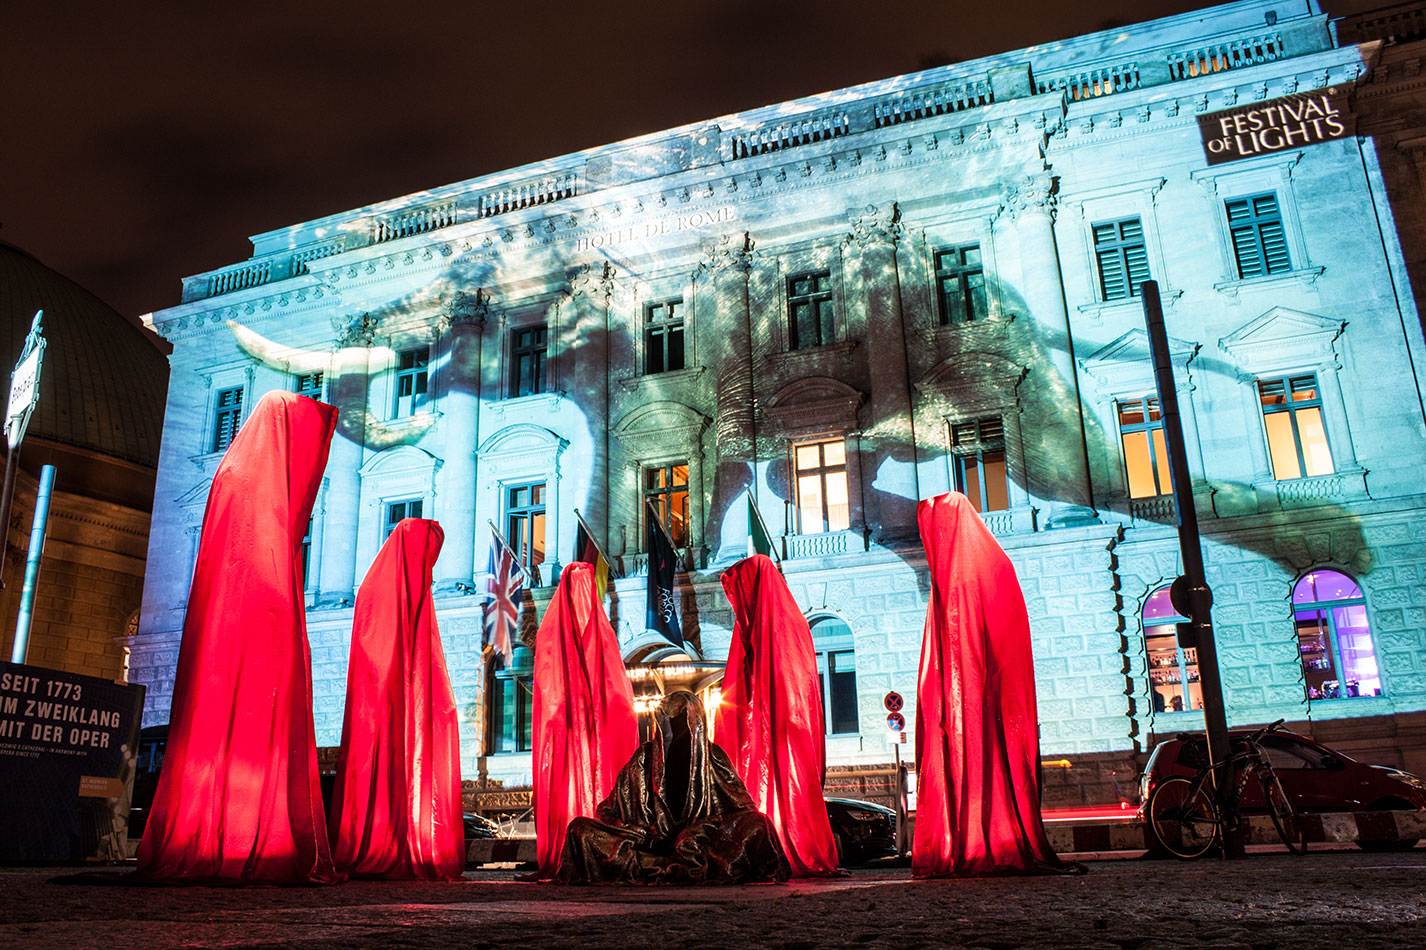 festival-of-lights-berlin-hotel-de-rome-light-art-show-exhibition-lumina-guardians-of-time-manfred-kili-kielnhofer-contemporary-arts-design-sculpture-3381